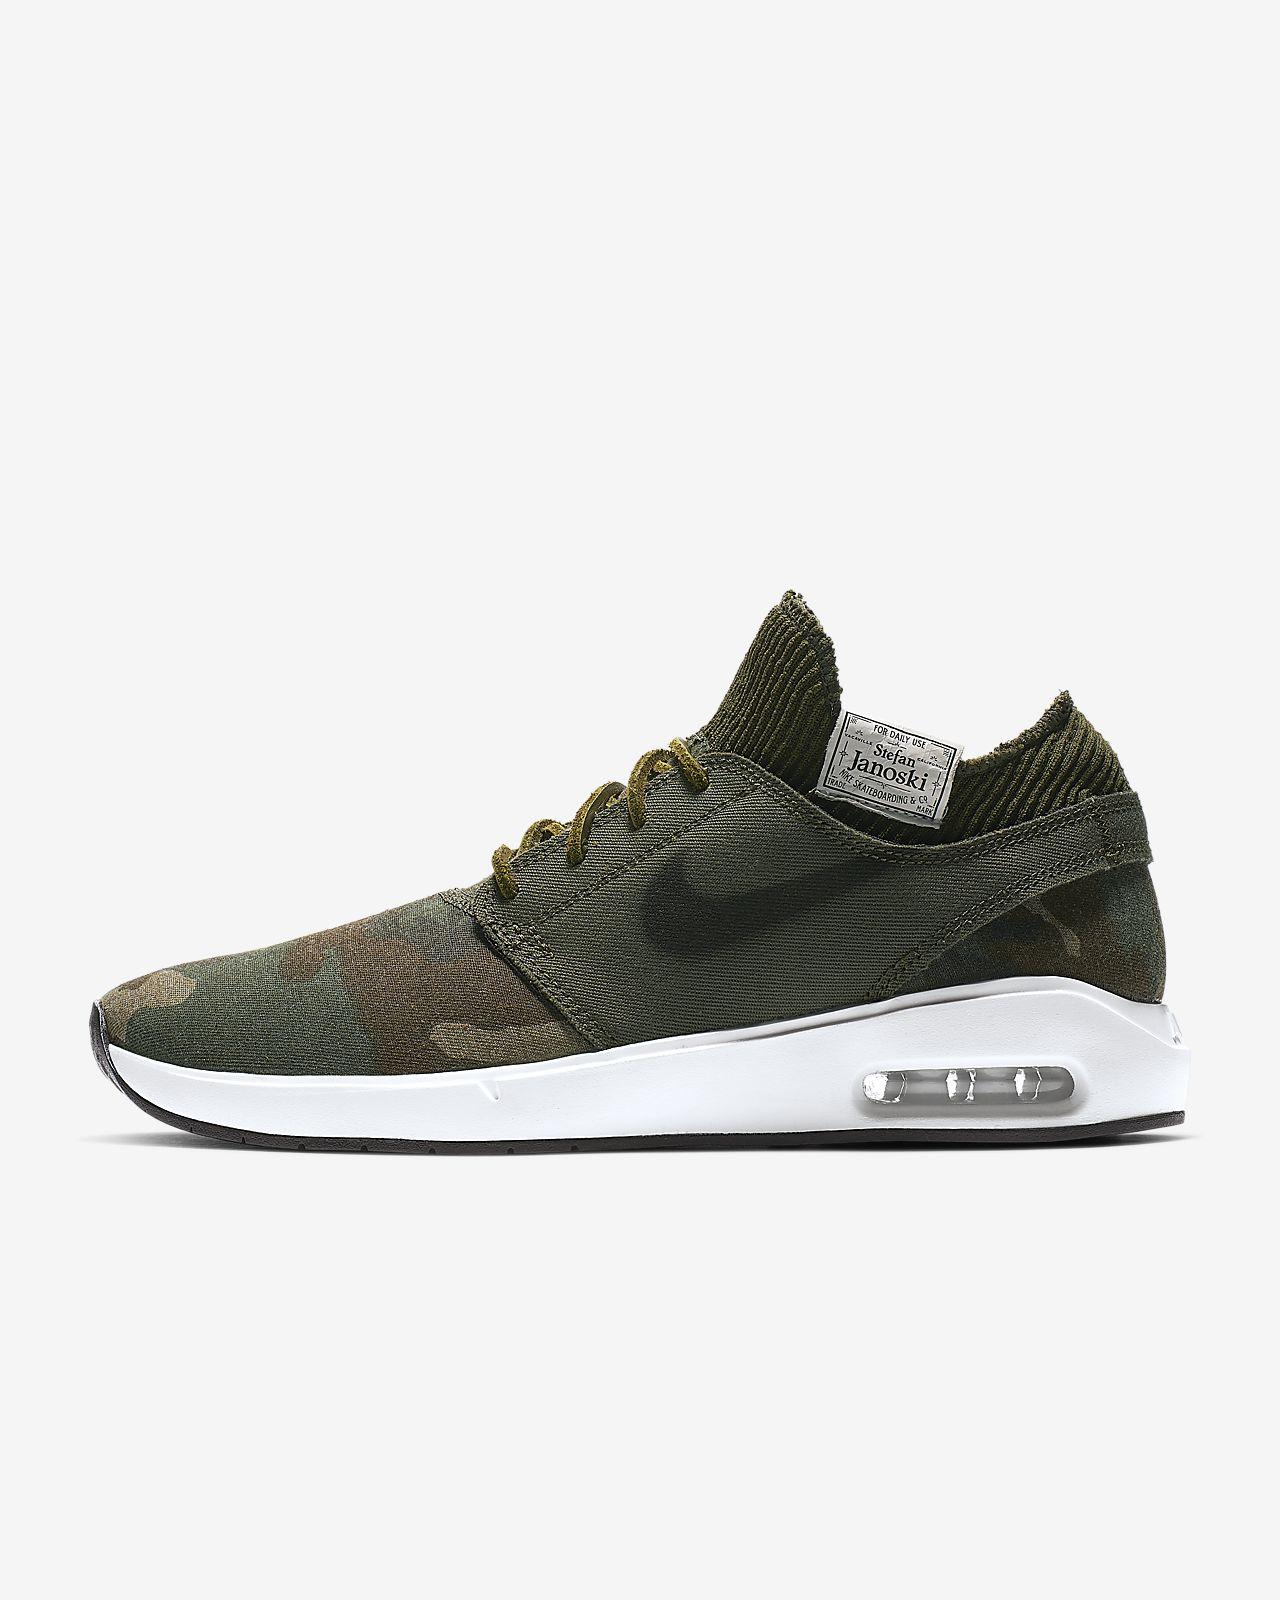 5f3dde37ce Nike SB Air Max Stefan Janoski 2 Premium Men's Skate Shoe. Nike.com